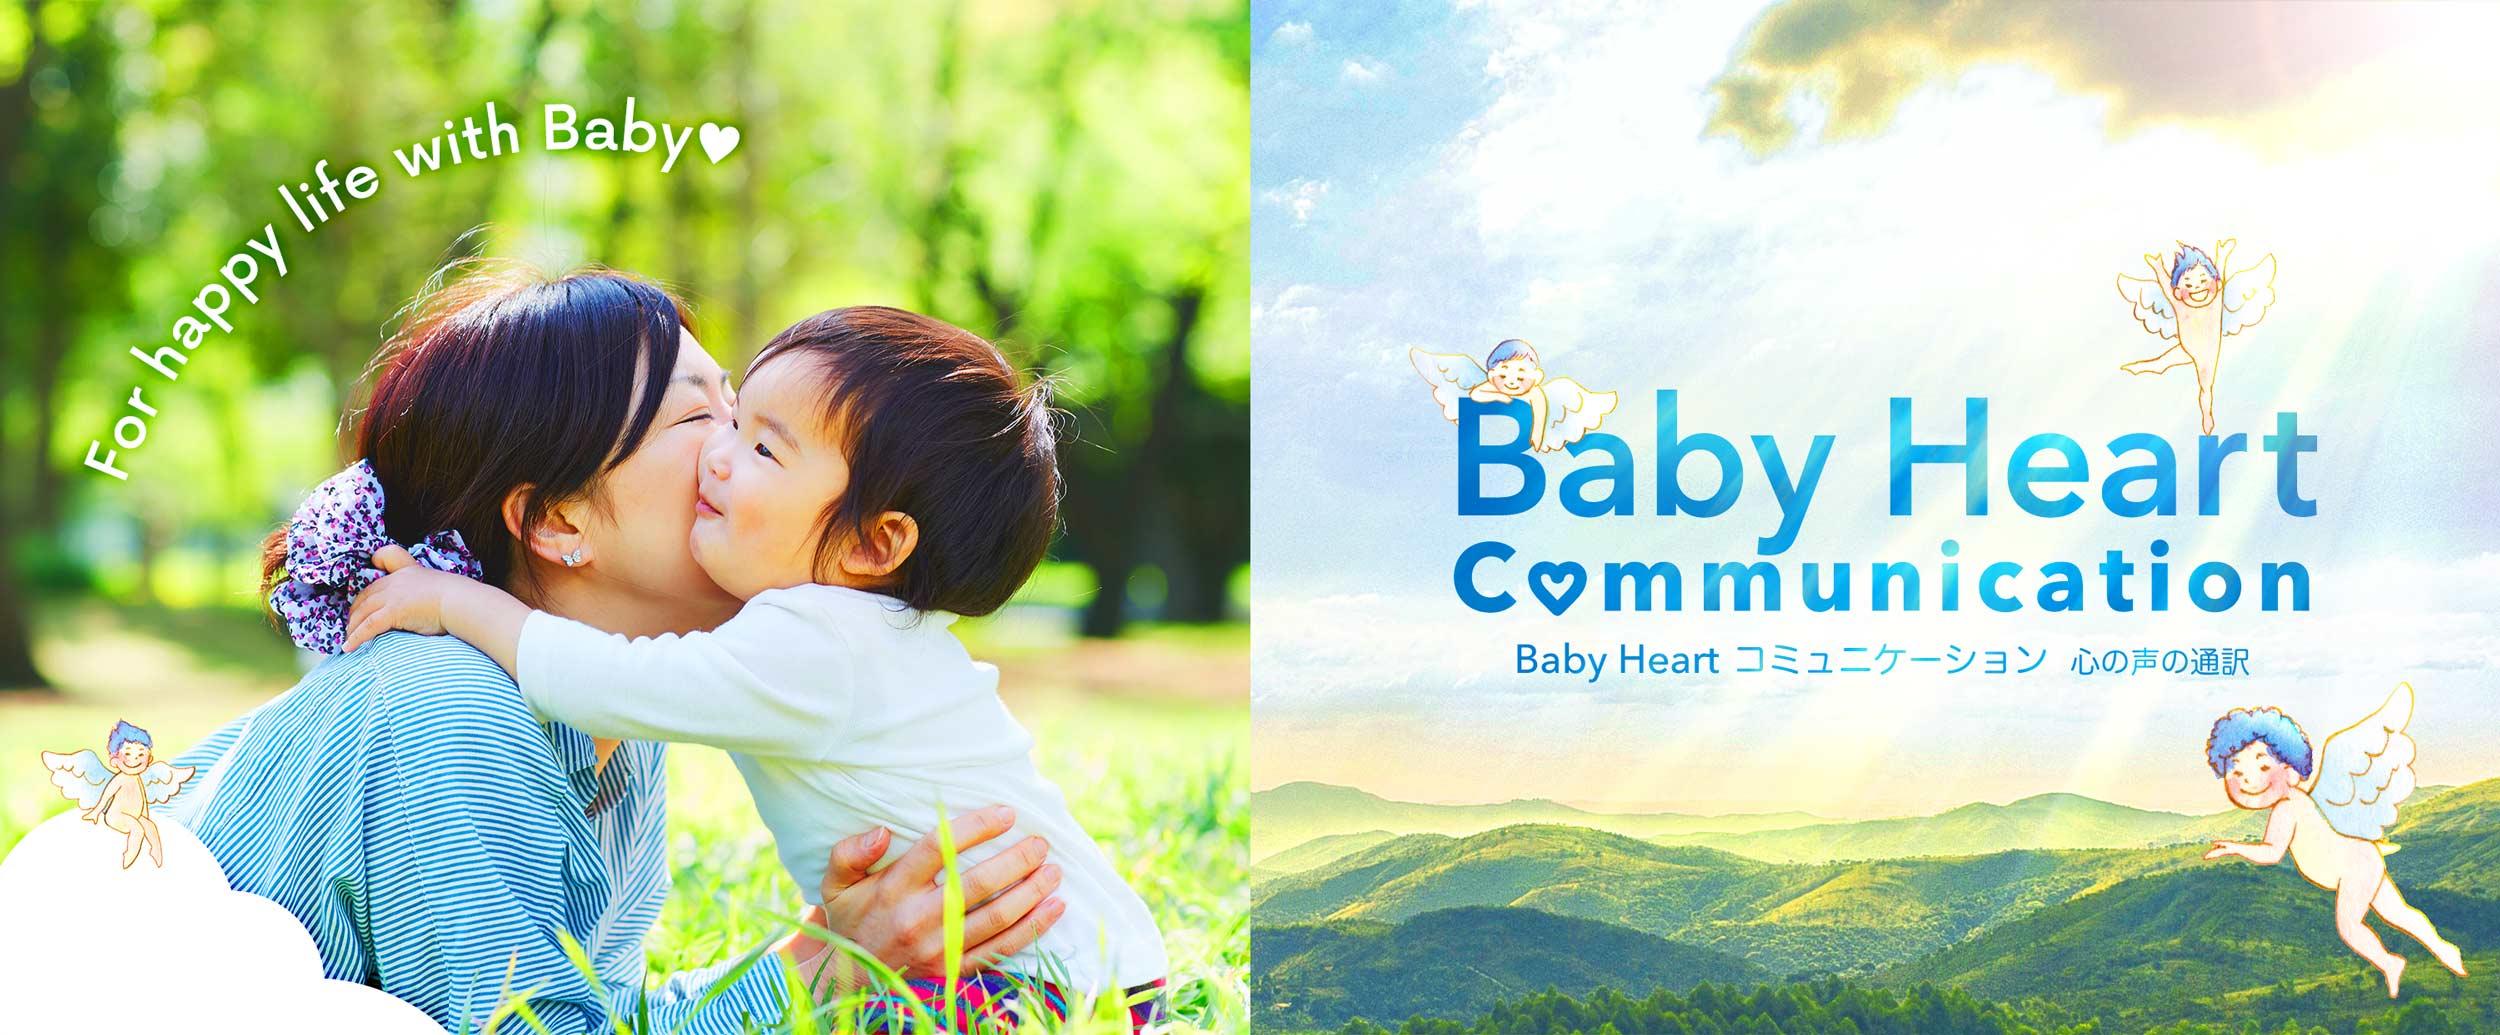 Baby Heart コミュニケーション